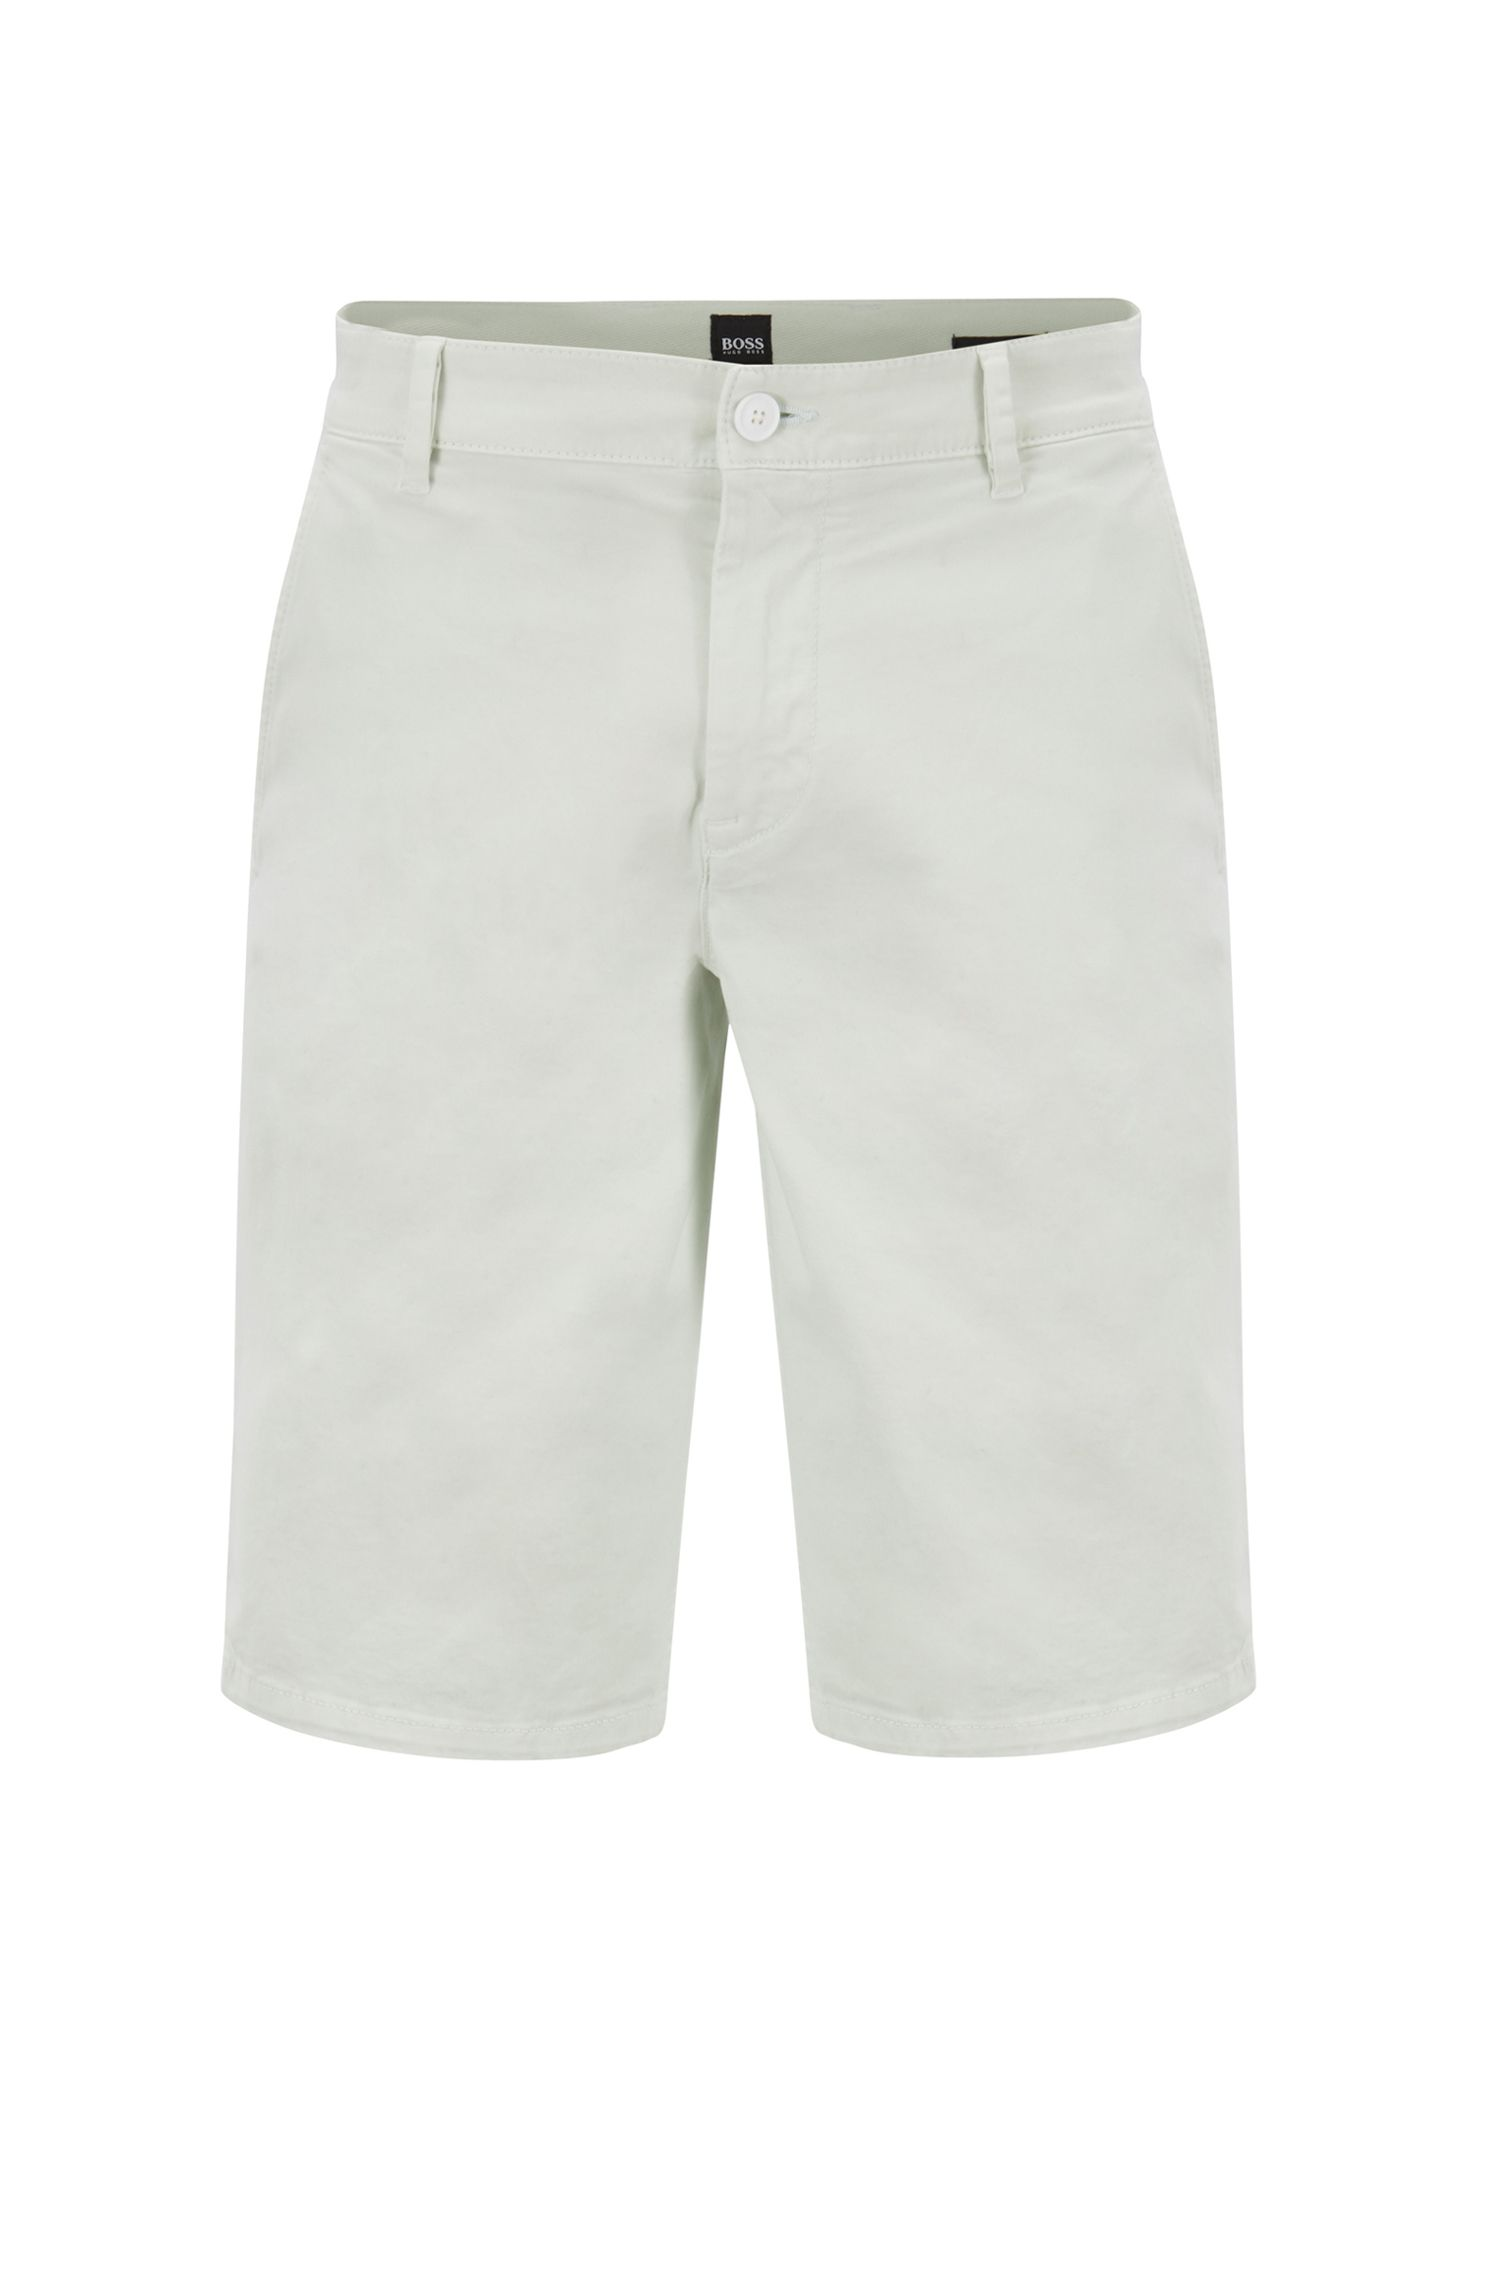 Shorts chinos slim fit en satén elástico con teñido doble, Cal